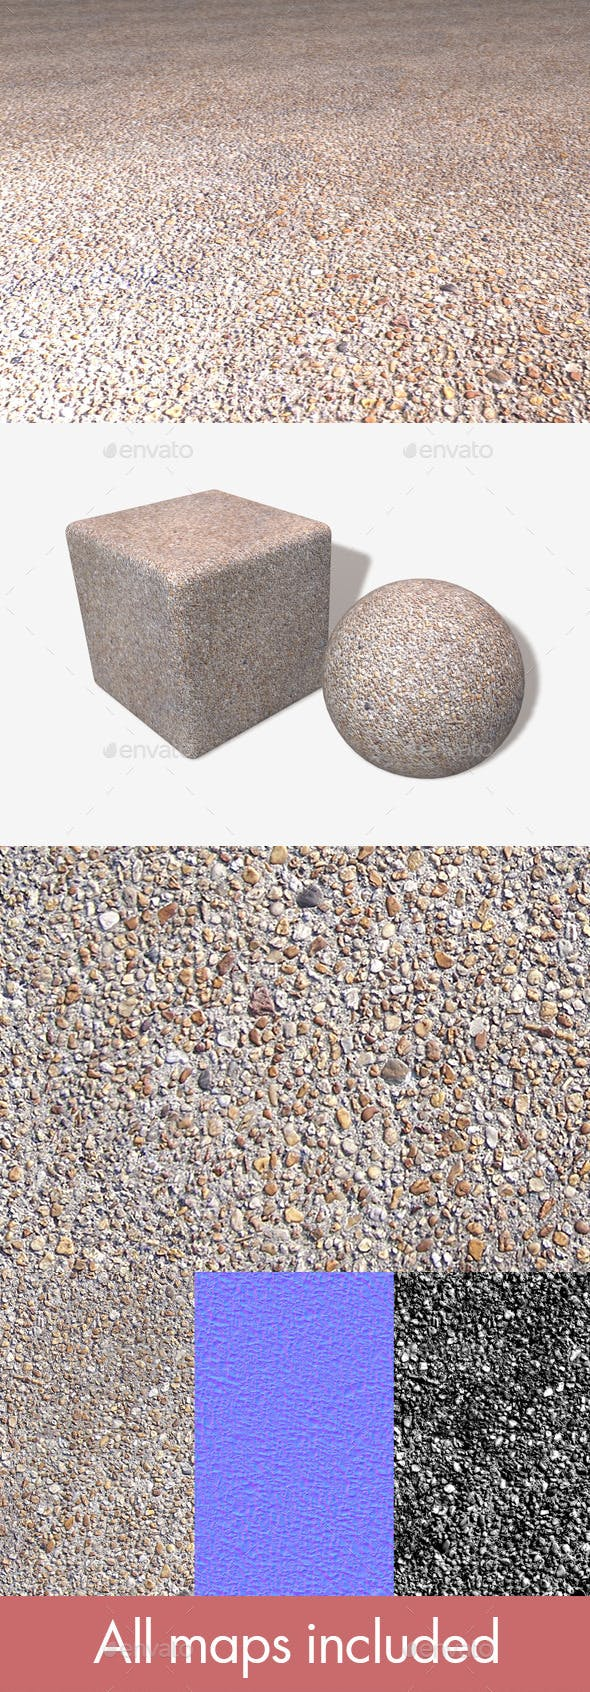 Gravel Pavement Seamless Texture - 3DOcean Item for Sale